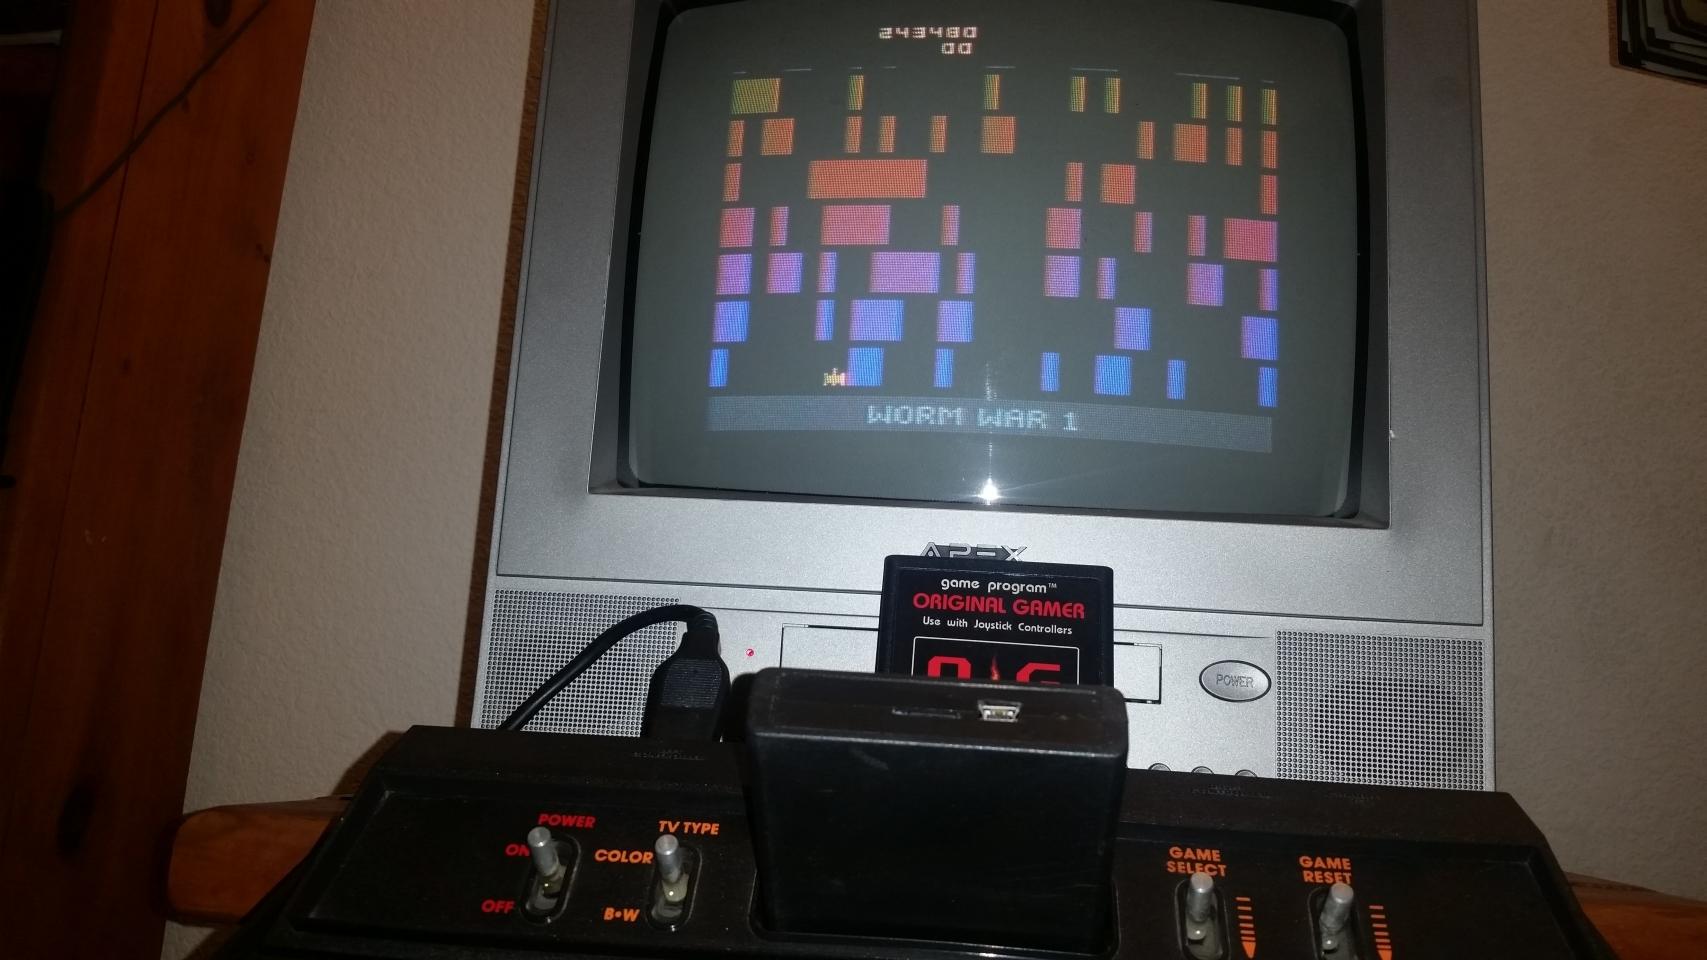 OriginalGamer: Worm War I (Atari 2600 Novice/B) 243,480 points on 2018-01-07 04:13:00